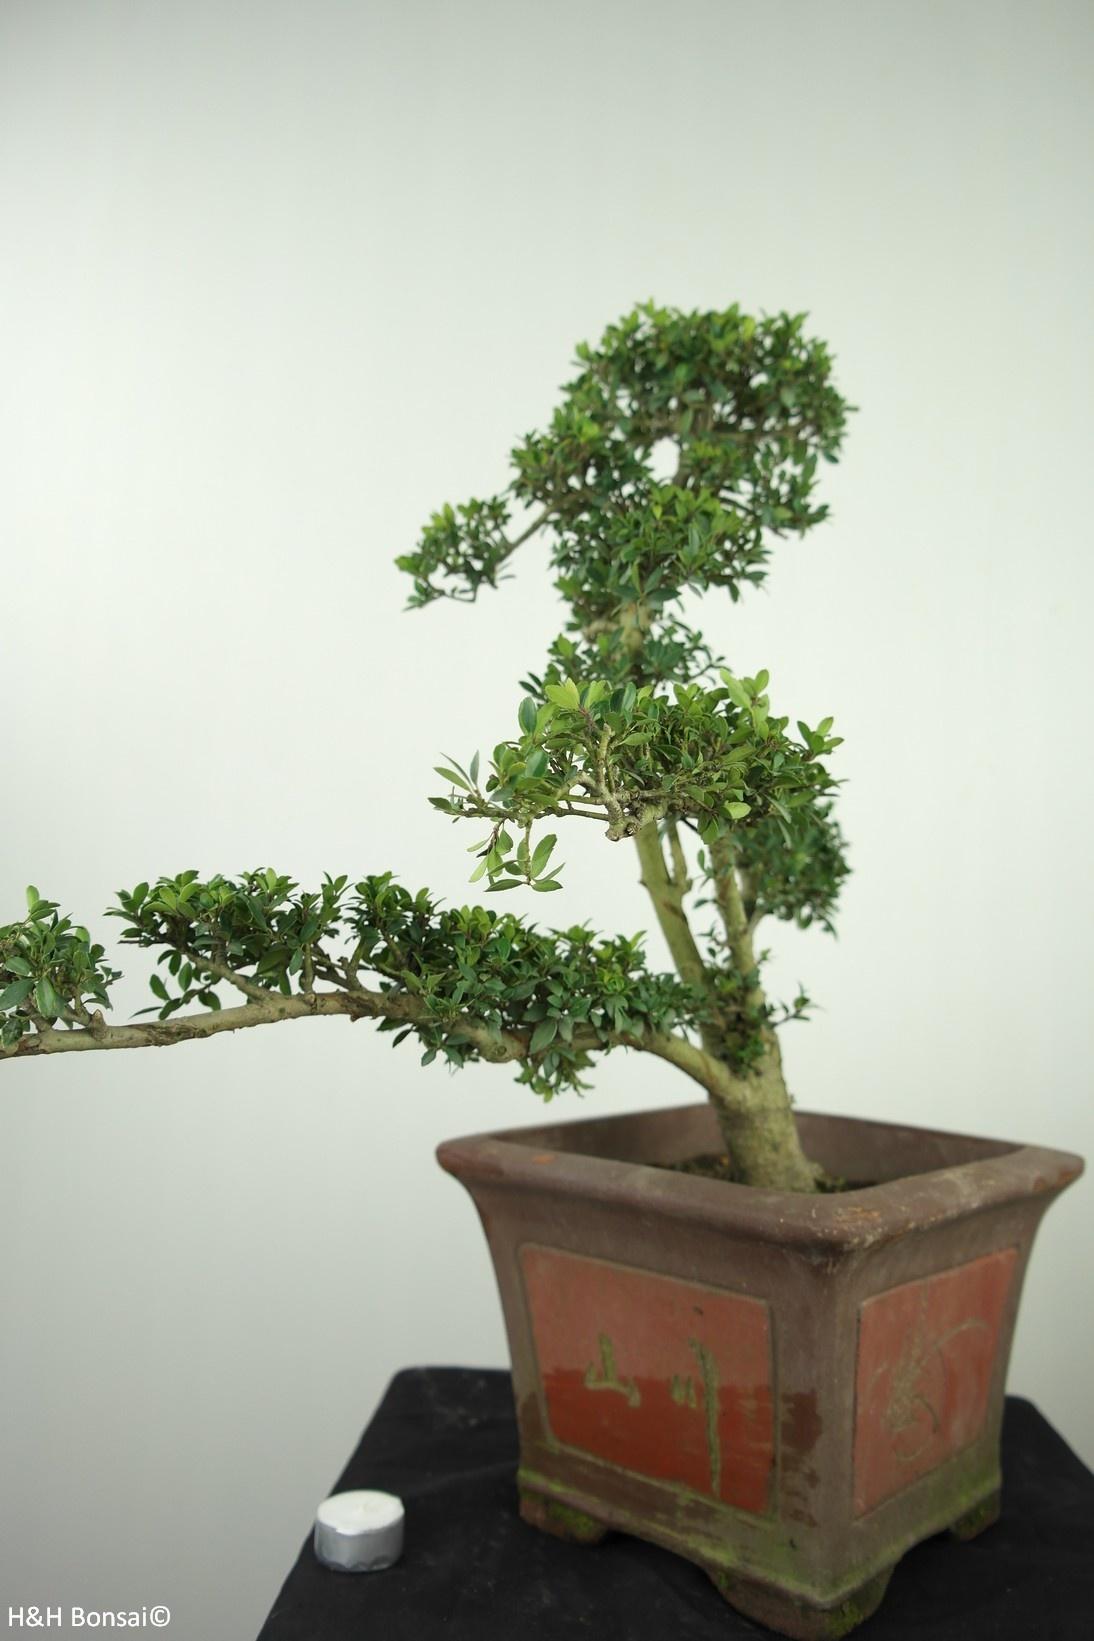 Bonsai Japanische Stechpalme, Ilex crenata, nr. 7747